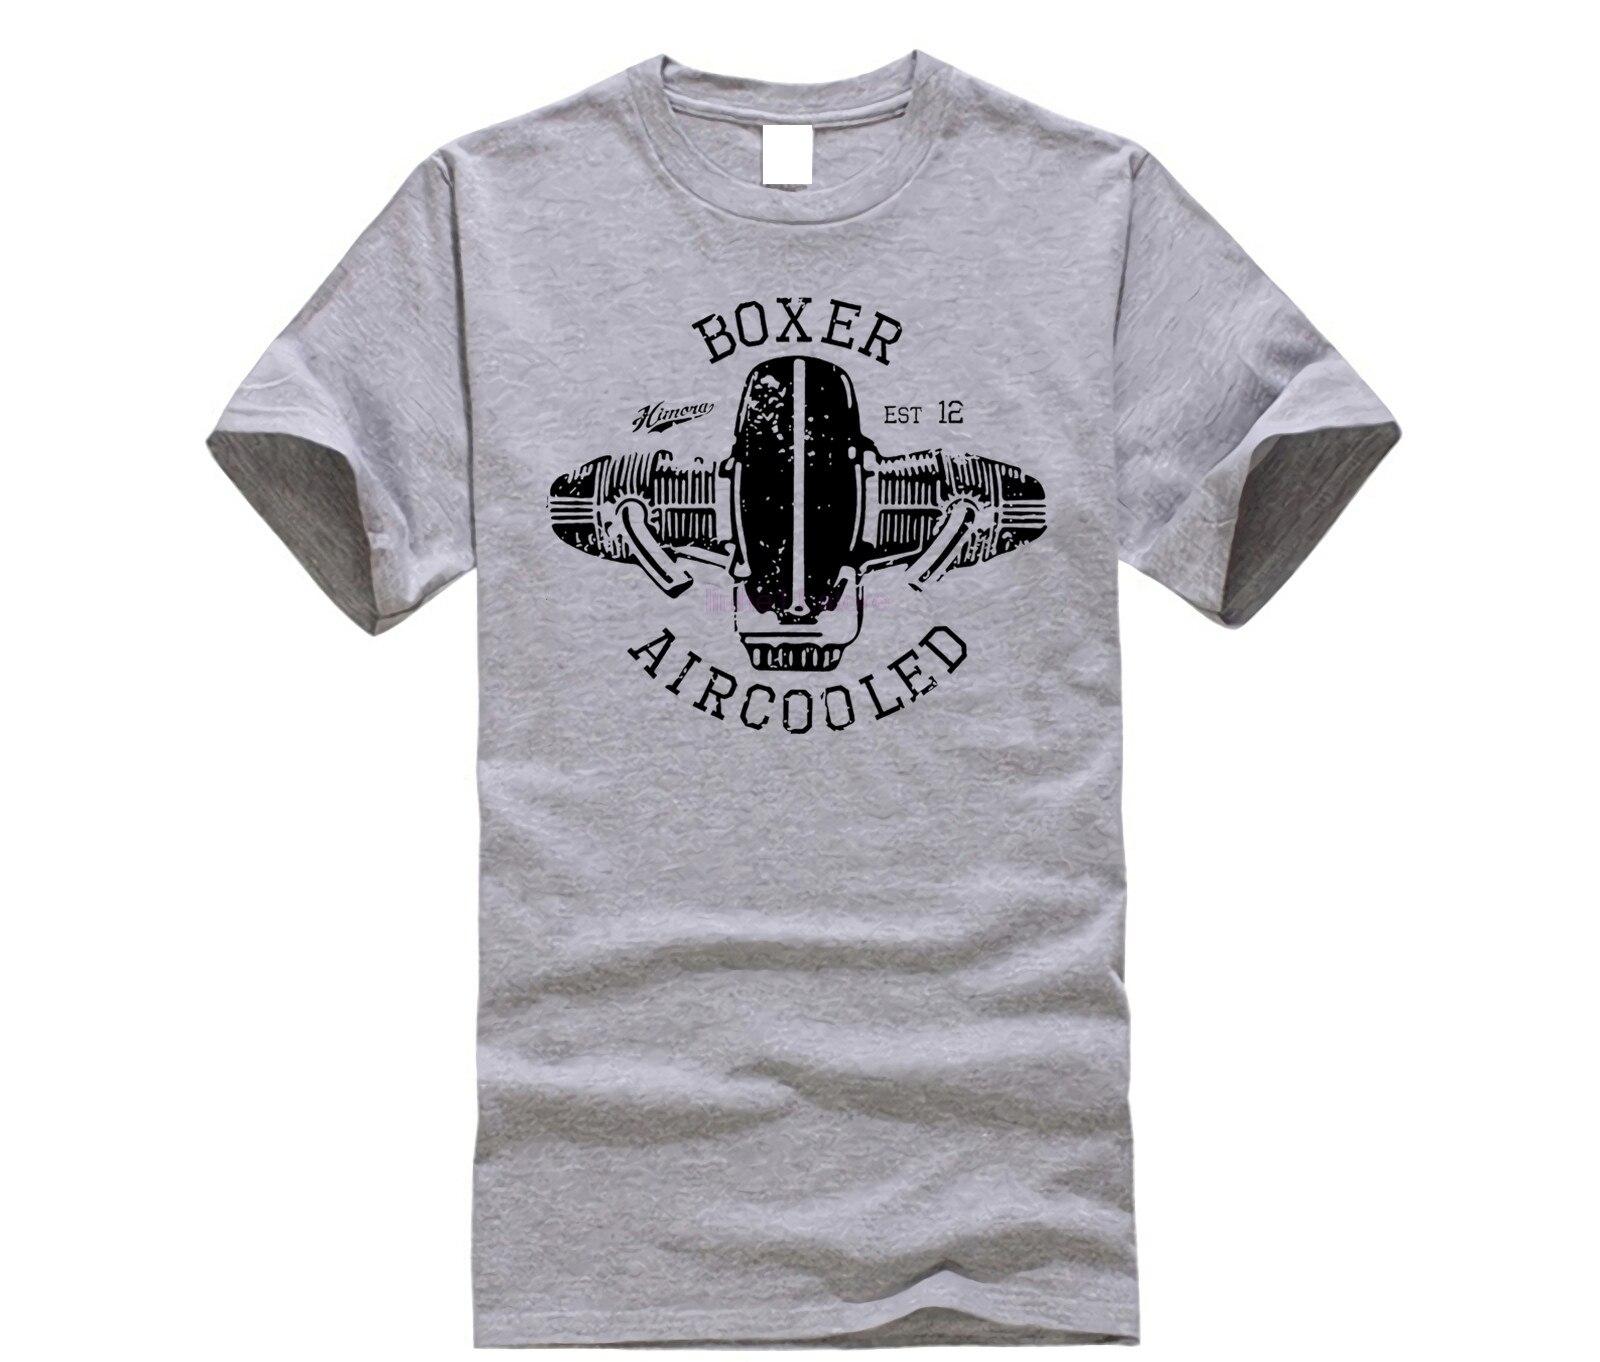 Gran oferta 2020 camiseta bóxer de algodón 100% con motor de motocicleta alemana R100 R80 R65 R nineT Nine T Scrambler camiseta